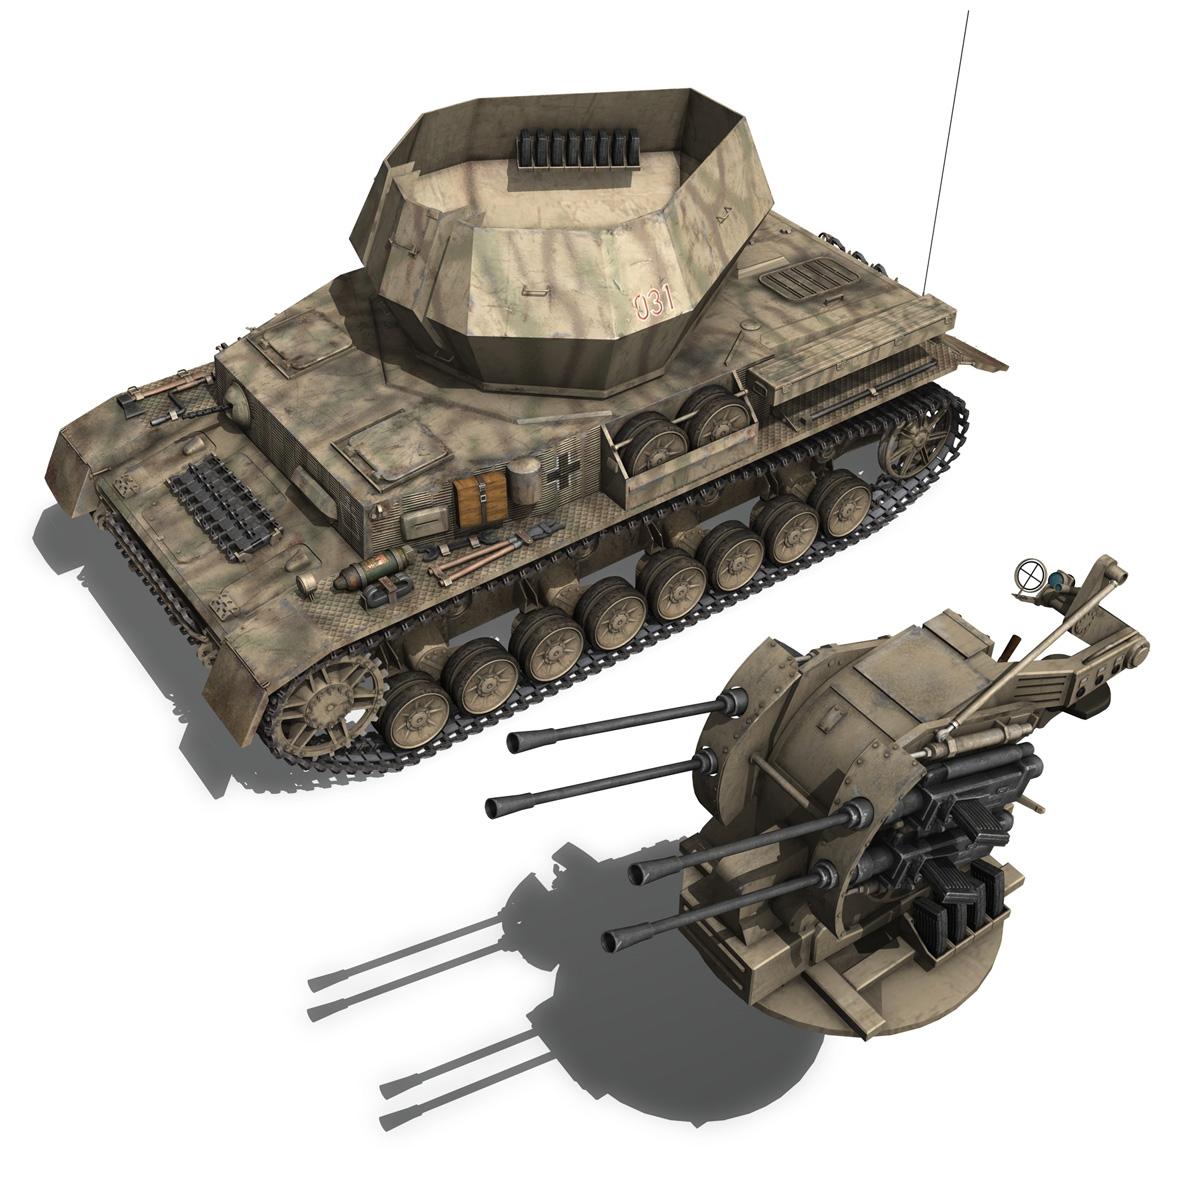 flakpanzer iv – wirbelwind 3d model 3ds fbx c4d lwo obj 191505